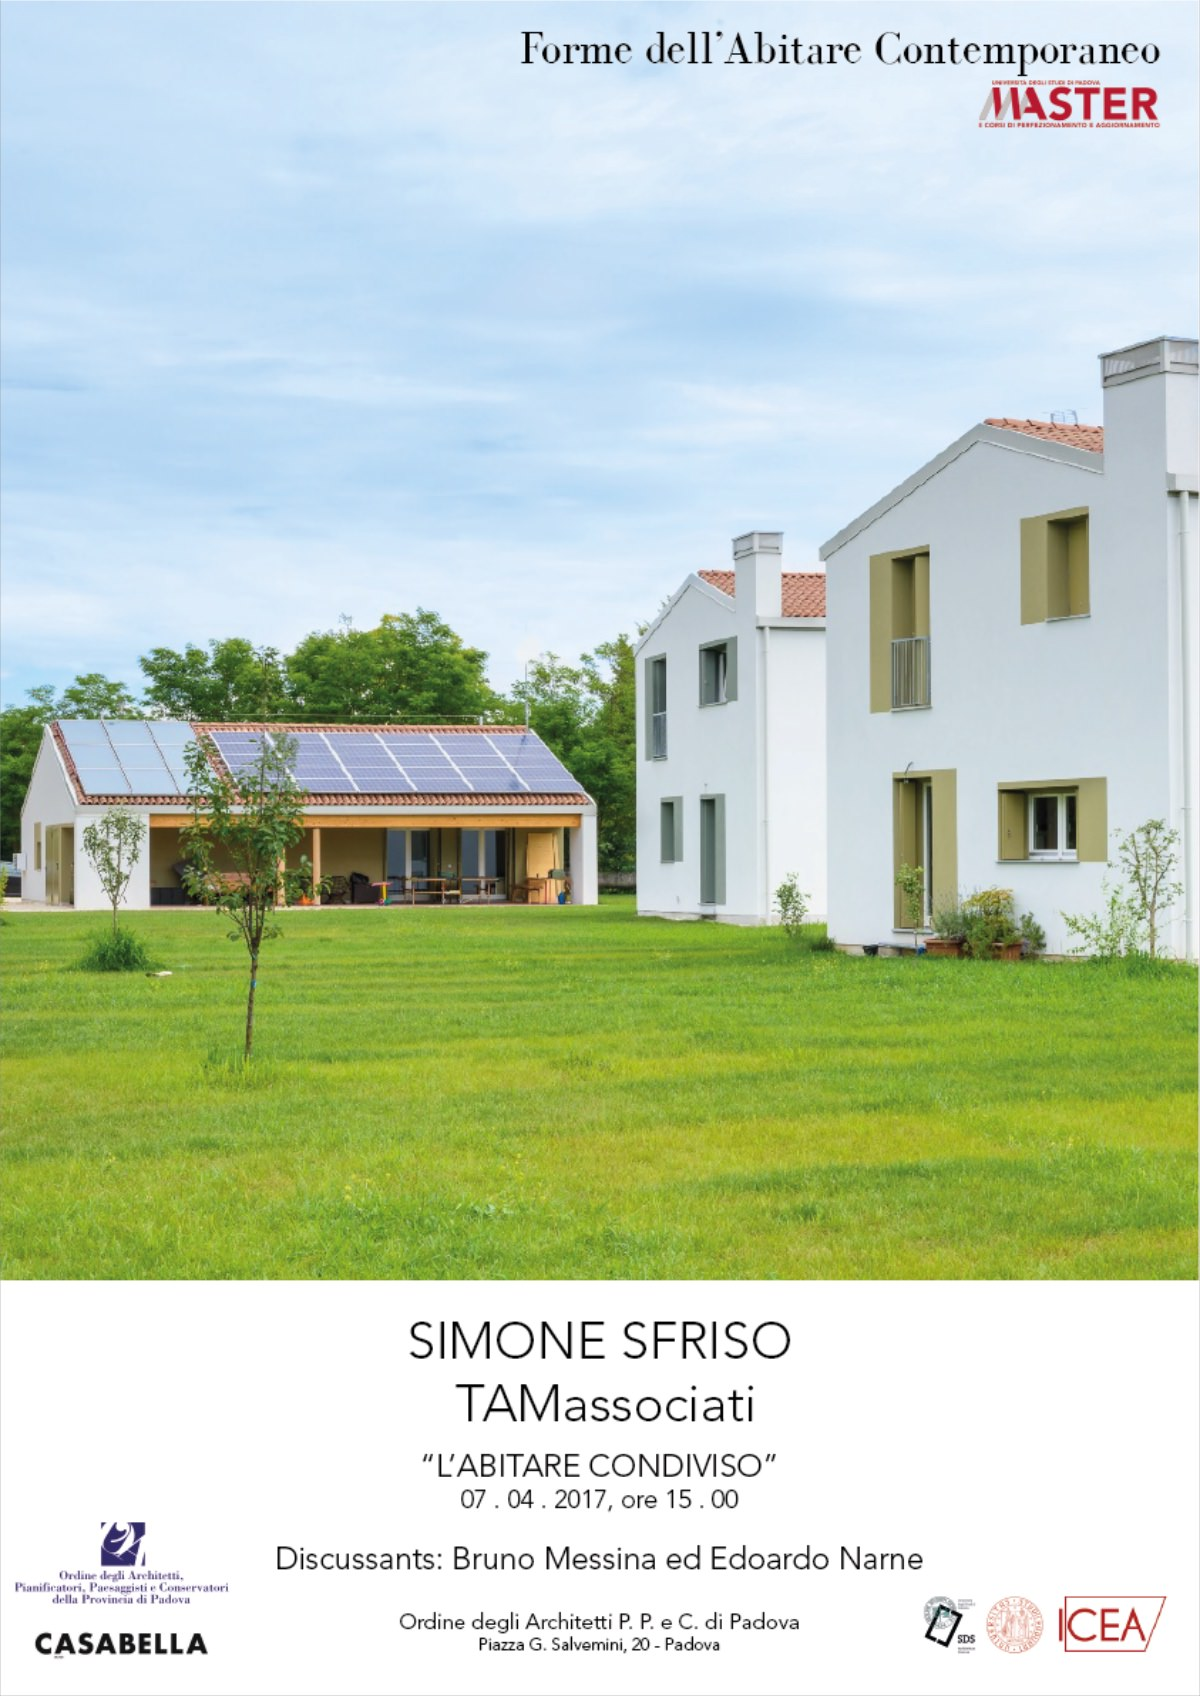 Simone Sfriso | TAMassociati PD